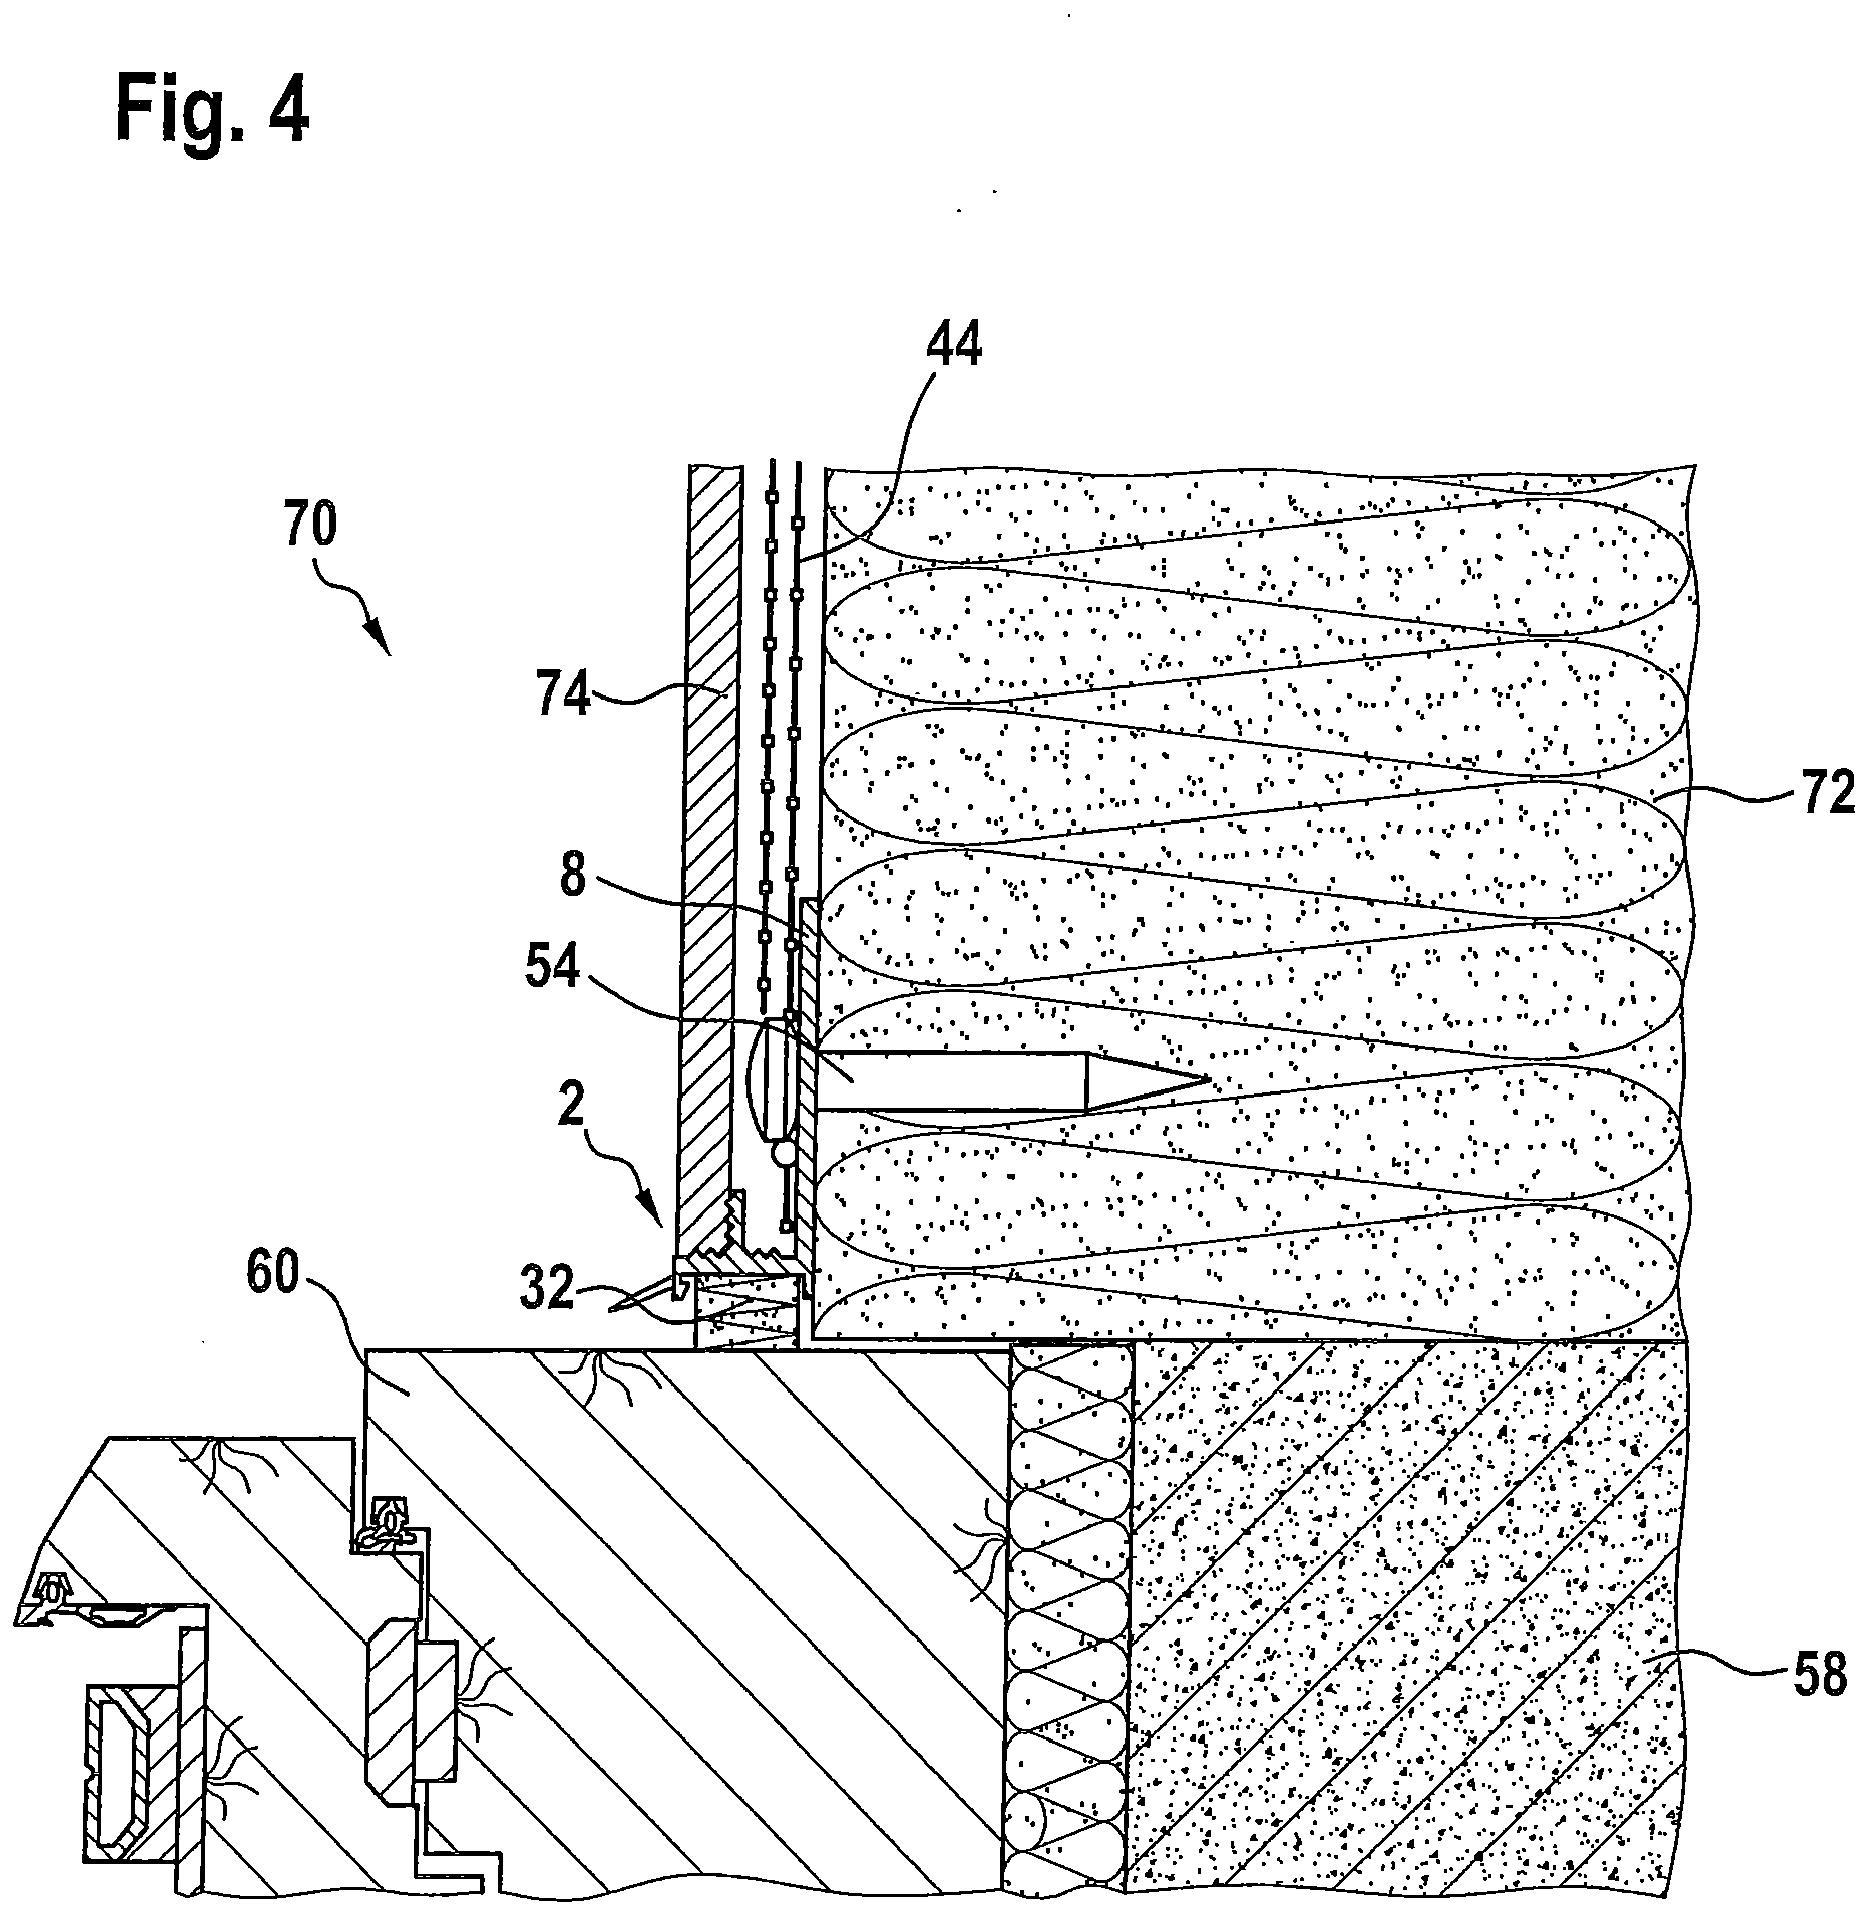 patent ep2505737a2 anputzleiste sowie bauwerksecke mit anputzleiste google patents. Black Bedroom Furniture Sets. Home Design Ideas